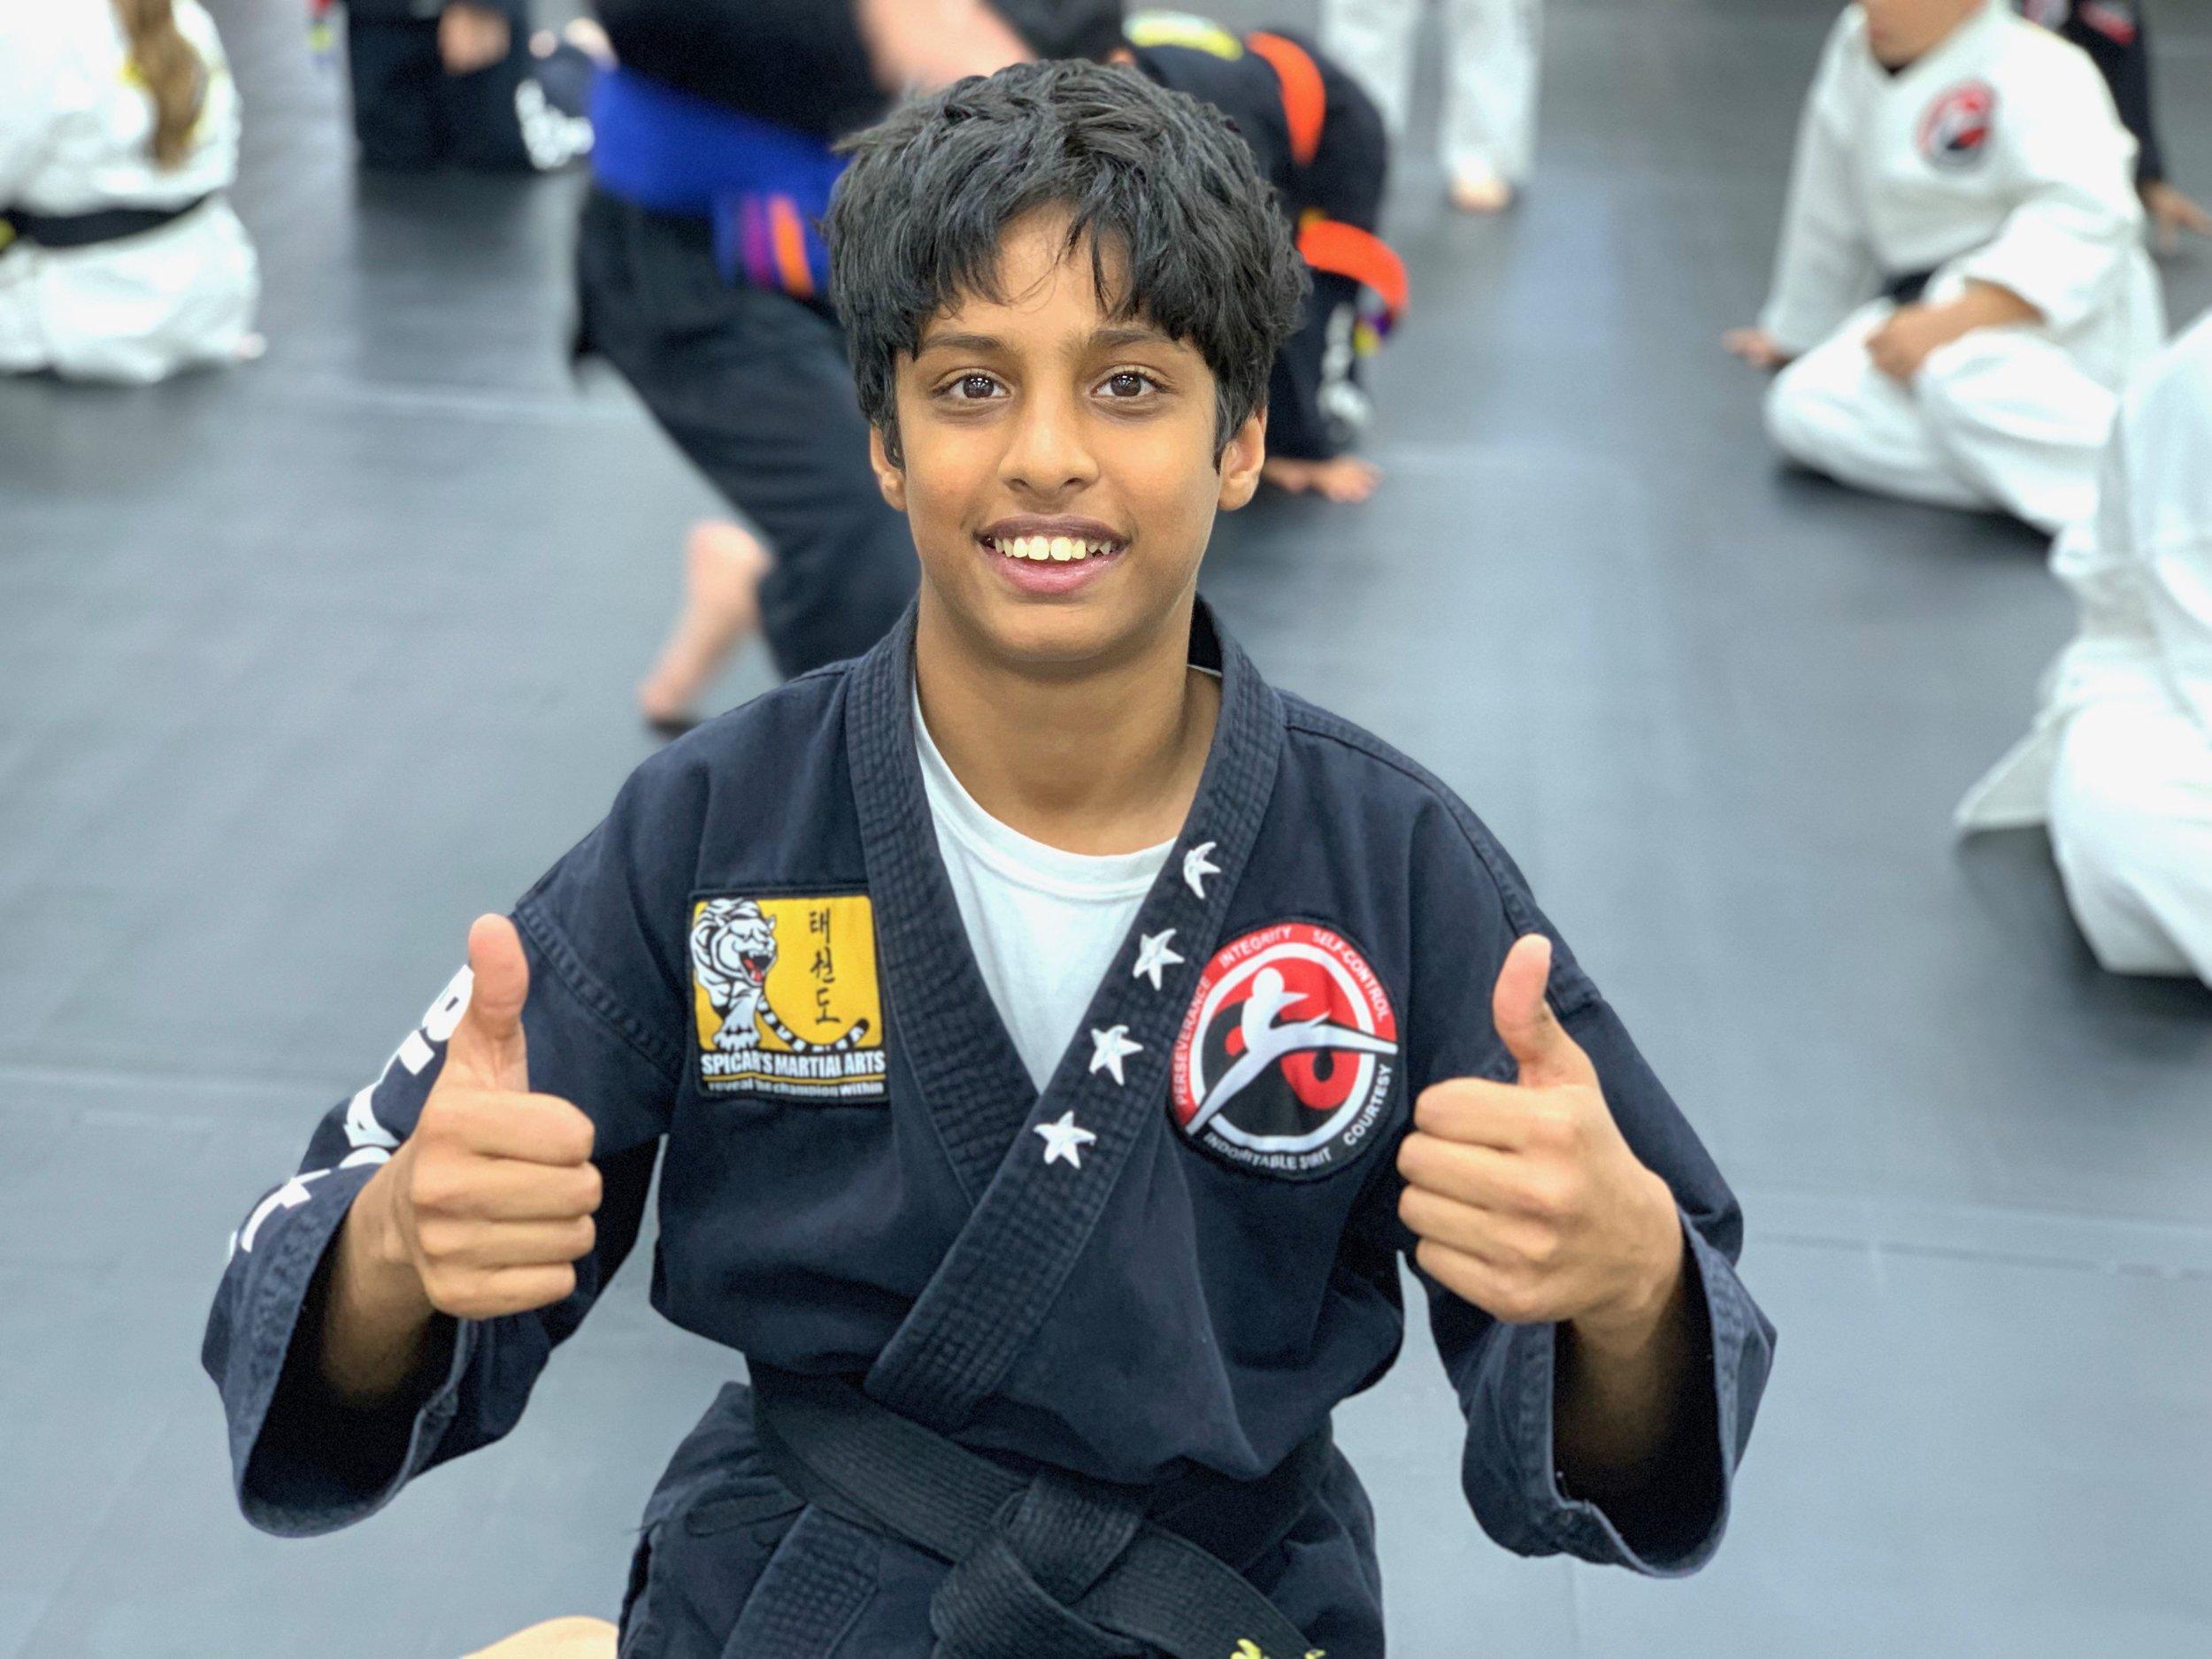 karate-kids-program-souhtlake-keller-grapevine-texas00036.jpeg